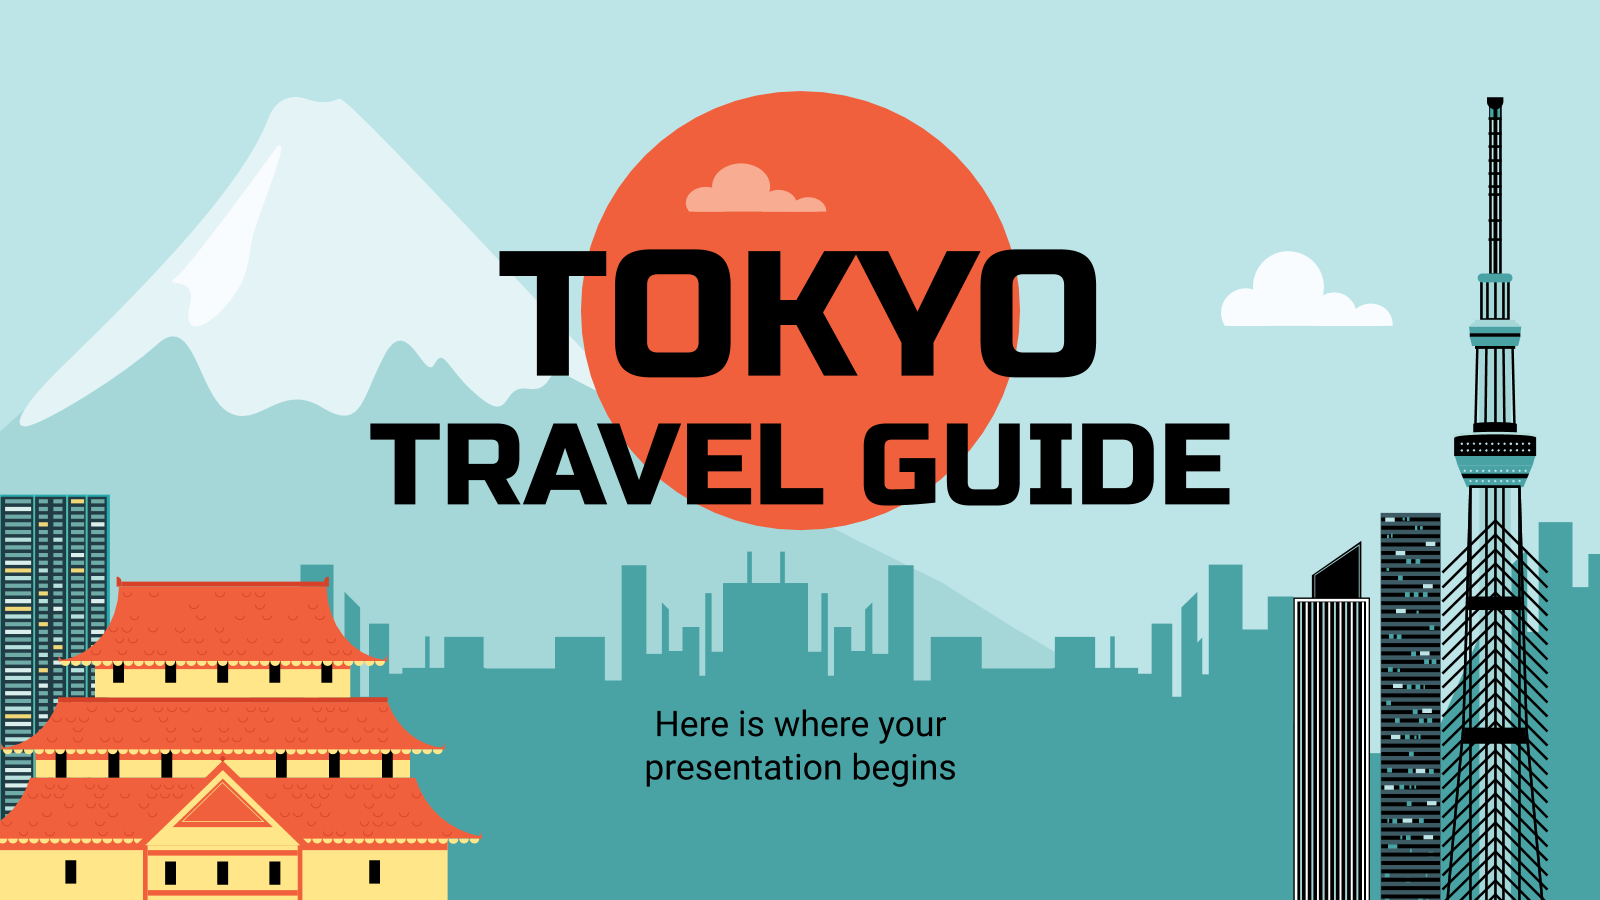 Plantilla de presentación Guía turística: Tokio